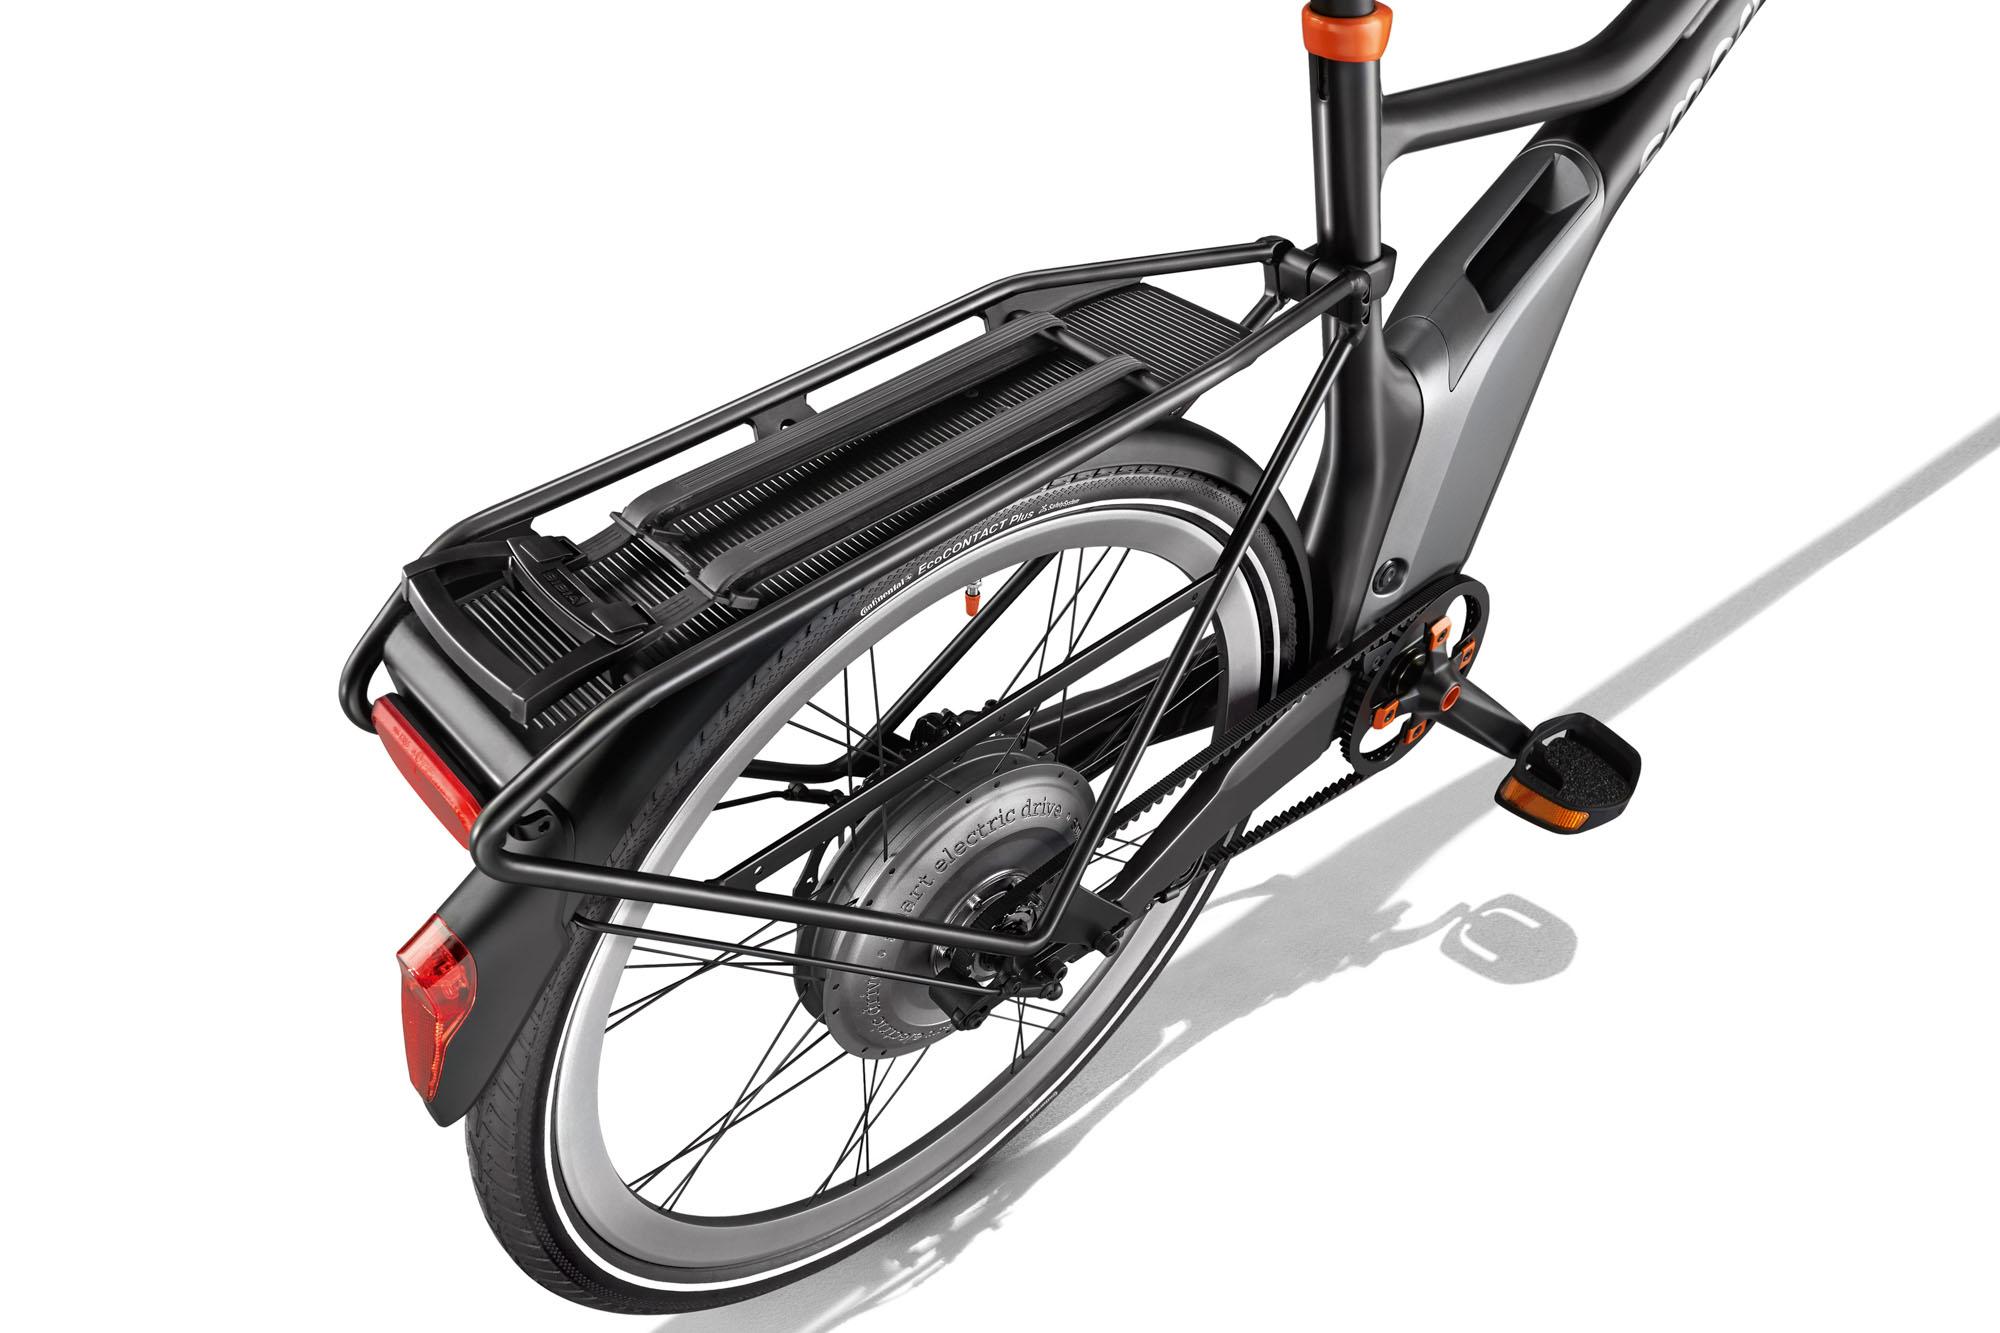 Smart_e_bike_3_4_black_Gepaecktraeger_A